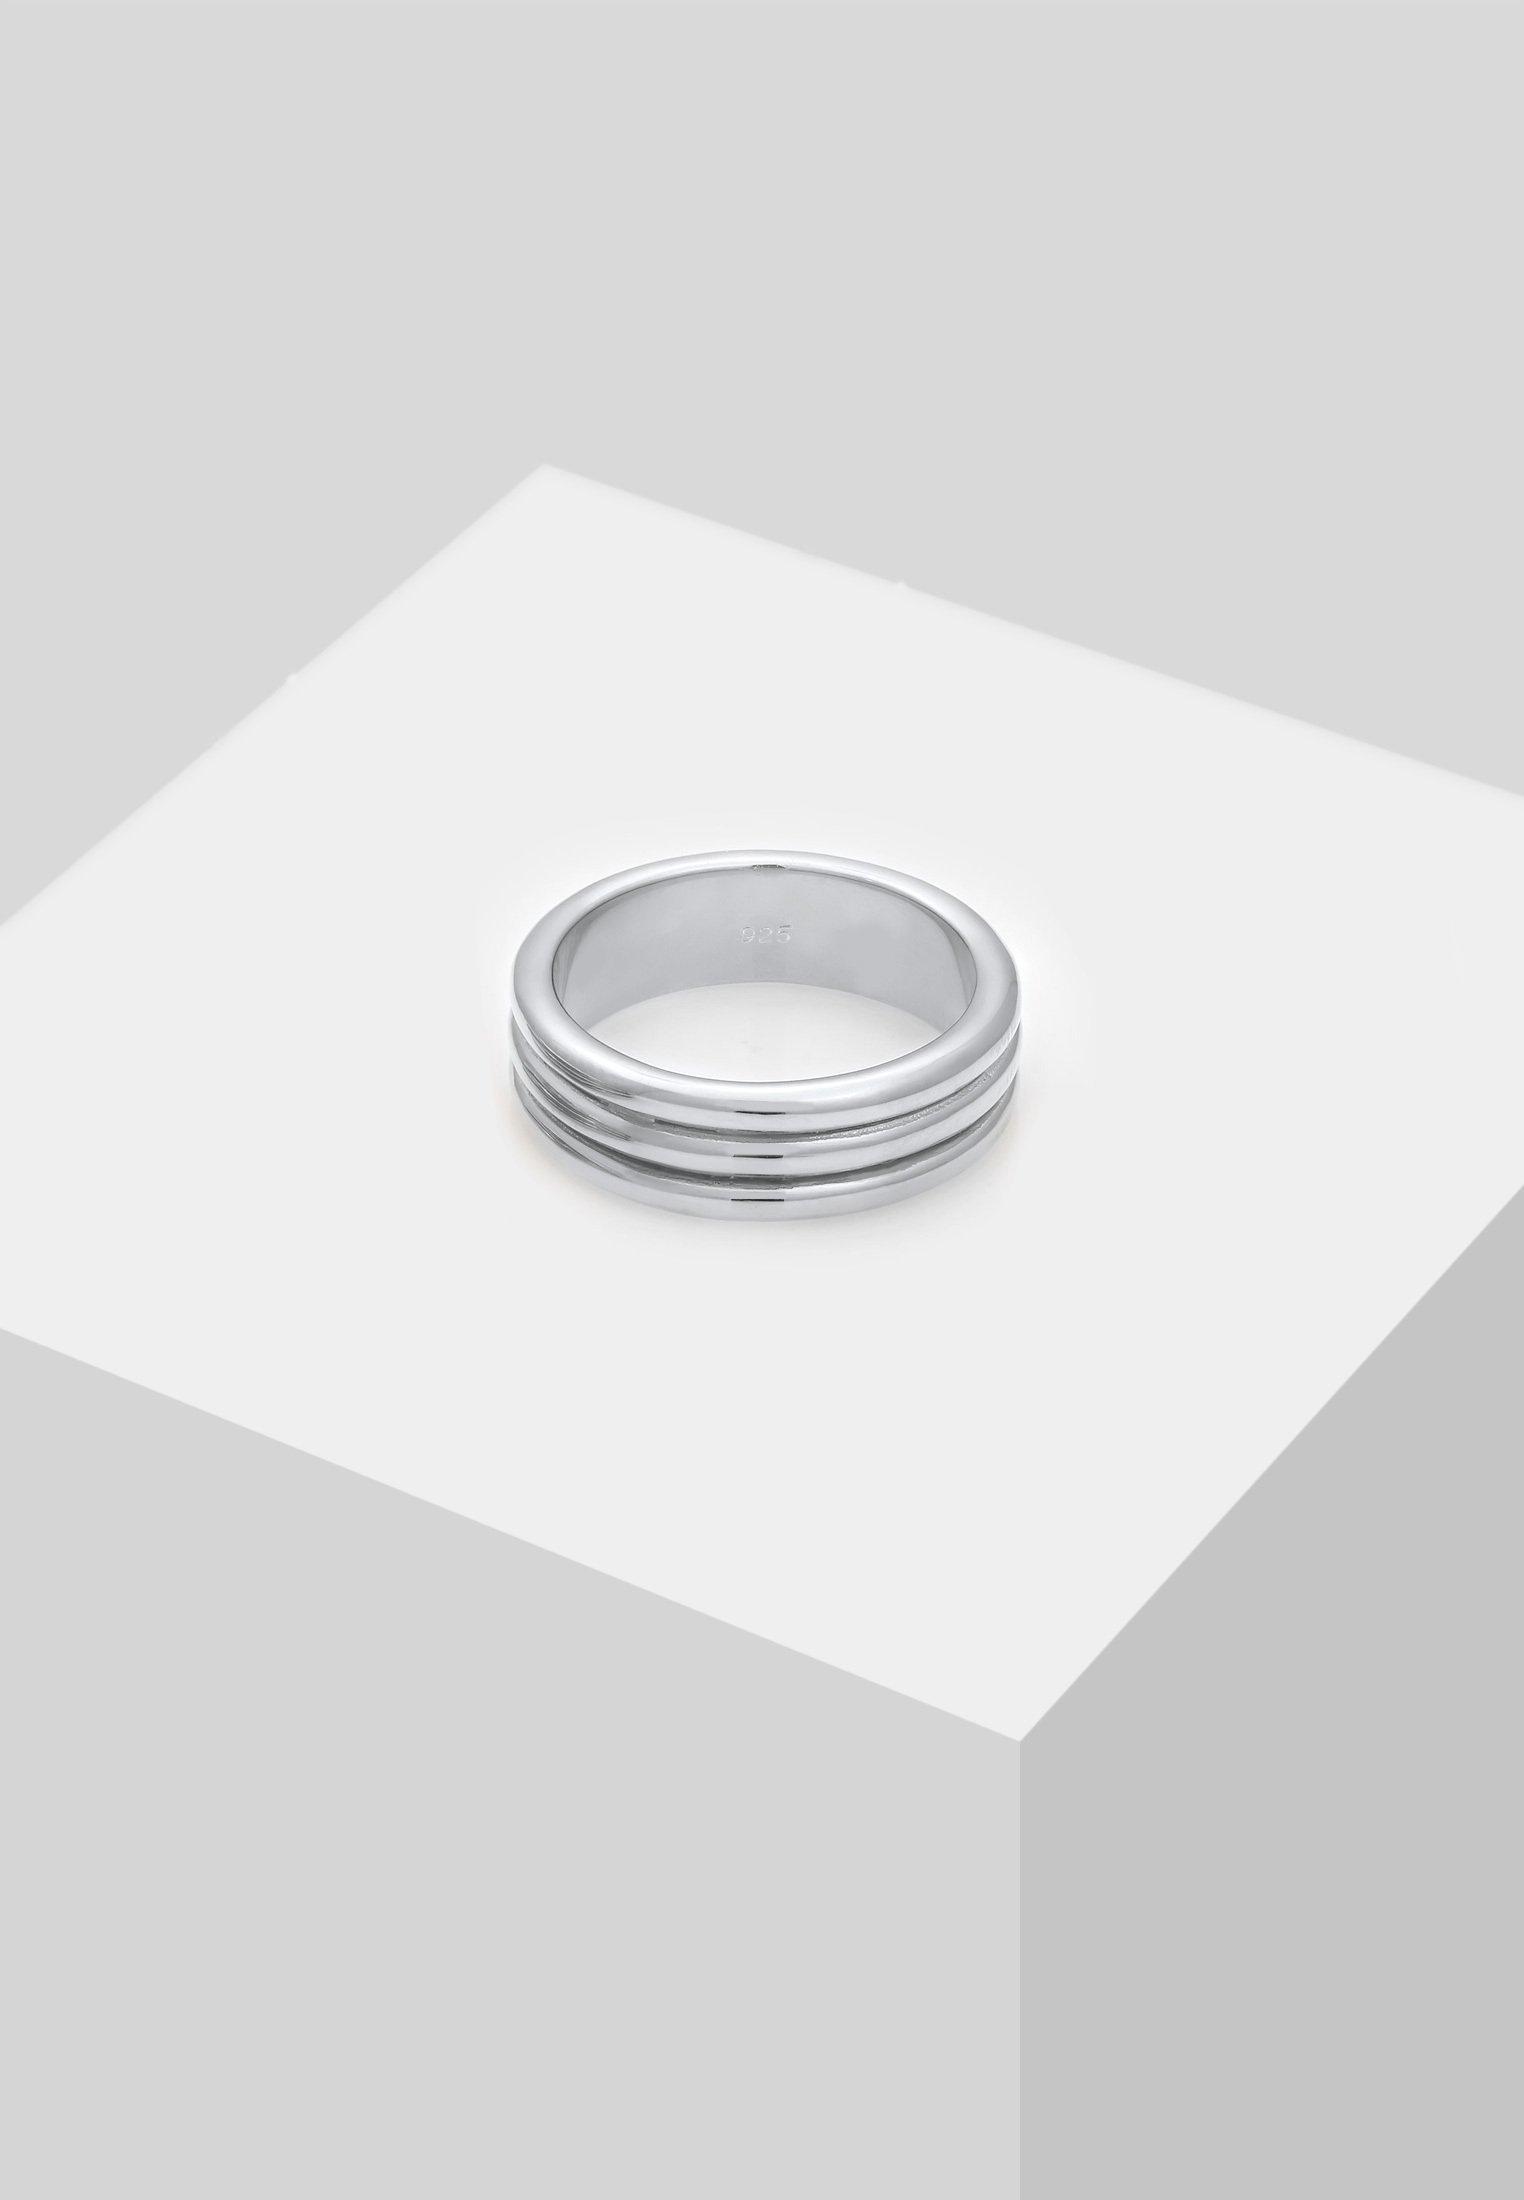 2020 New Online Shop Accessories Elli Ring silver-coloured 9ETHnDqgP yN8ZXlcue